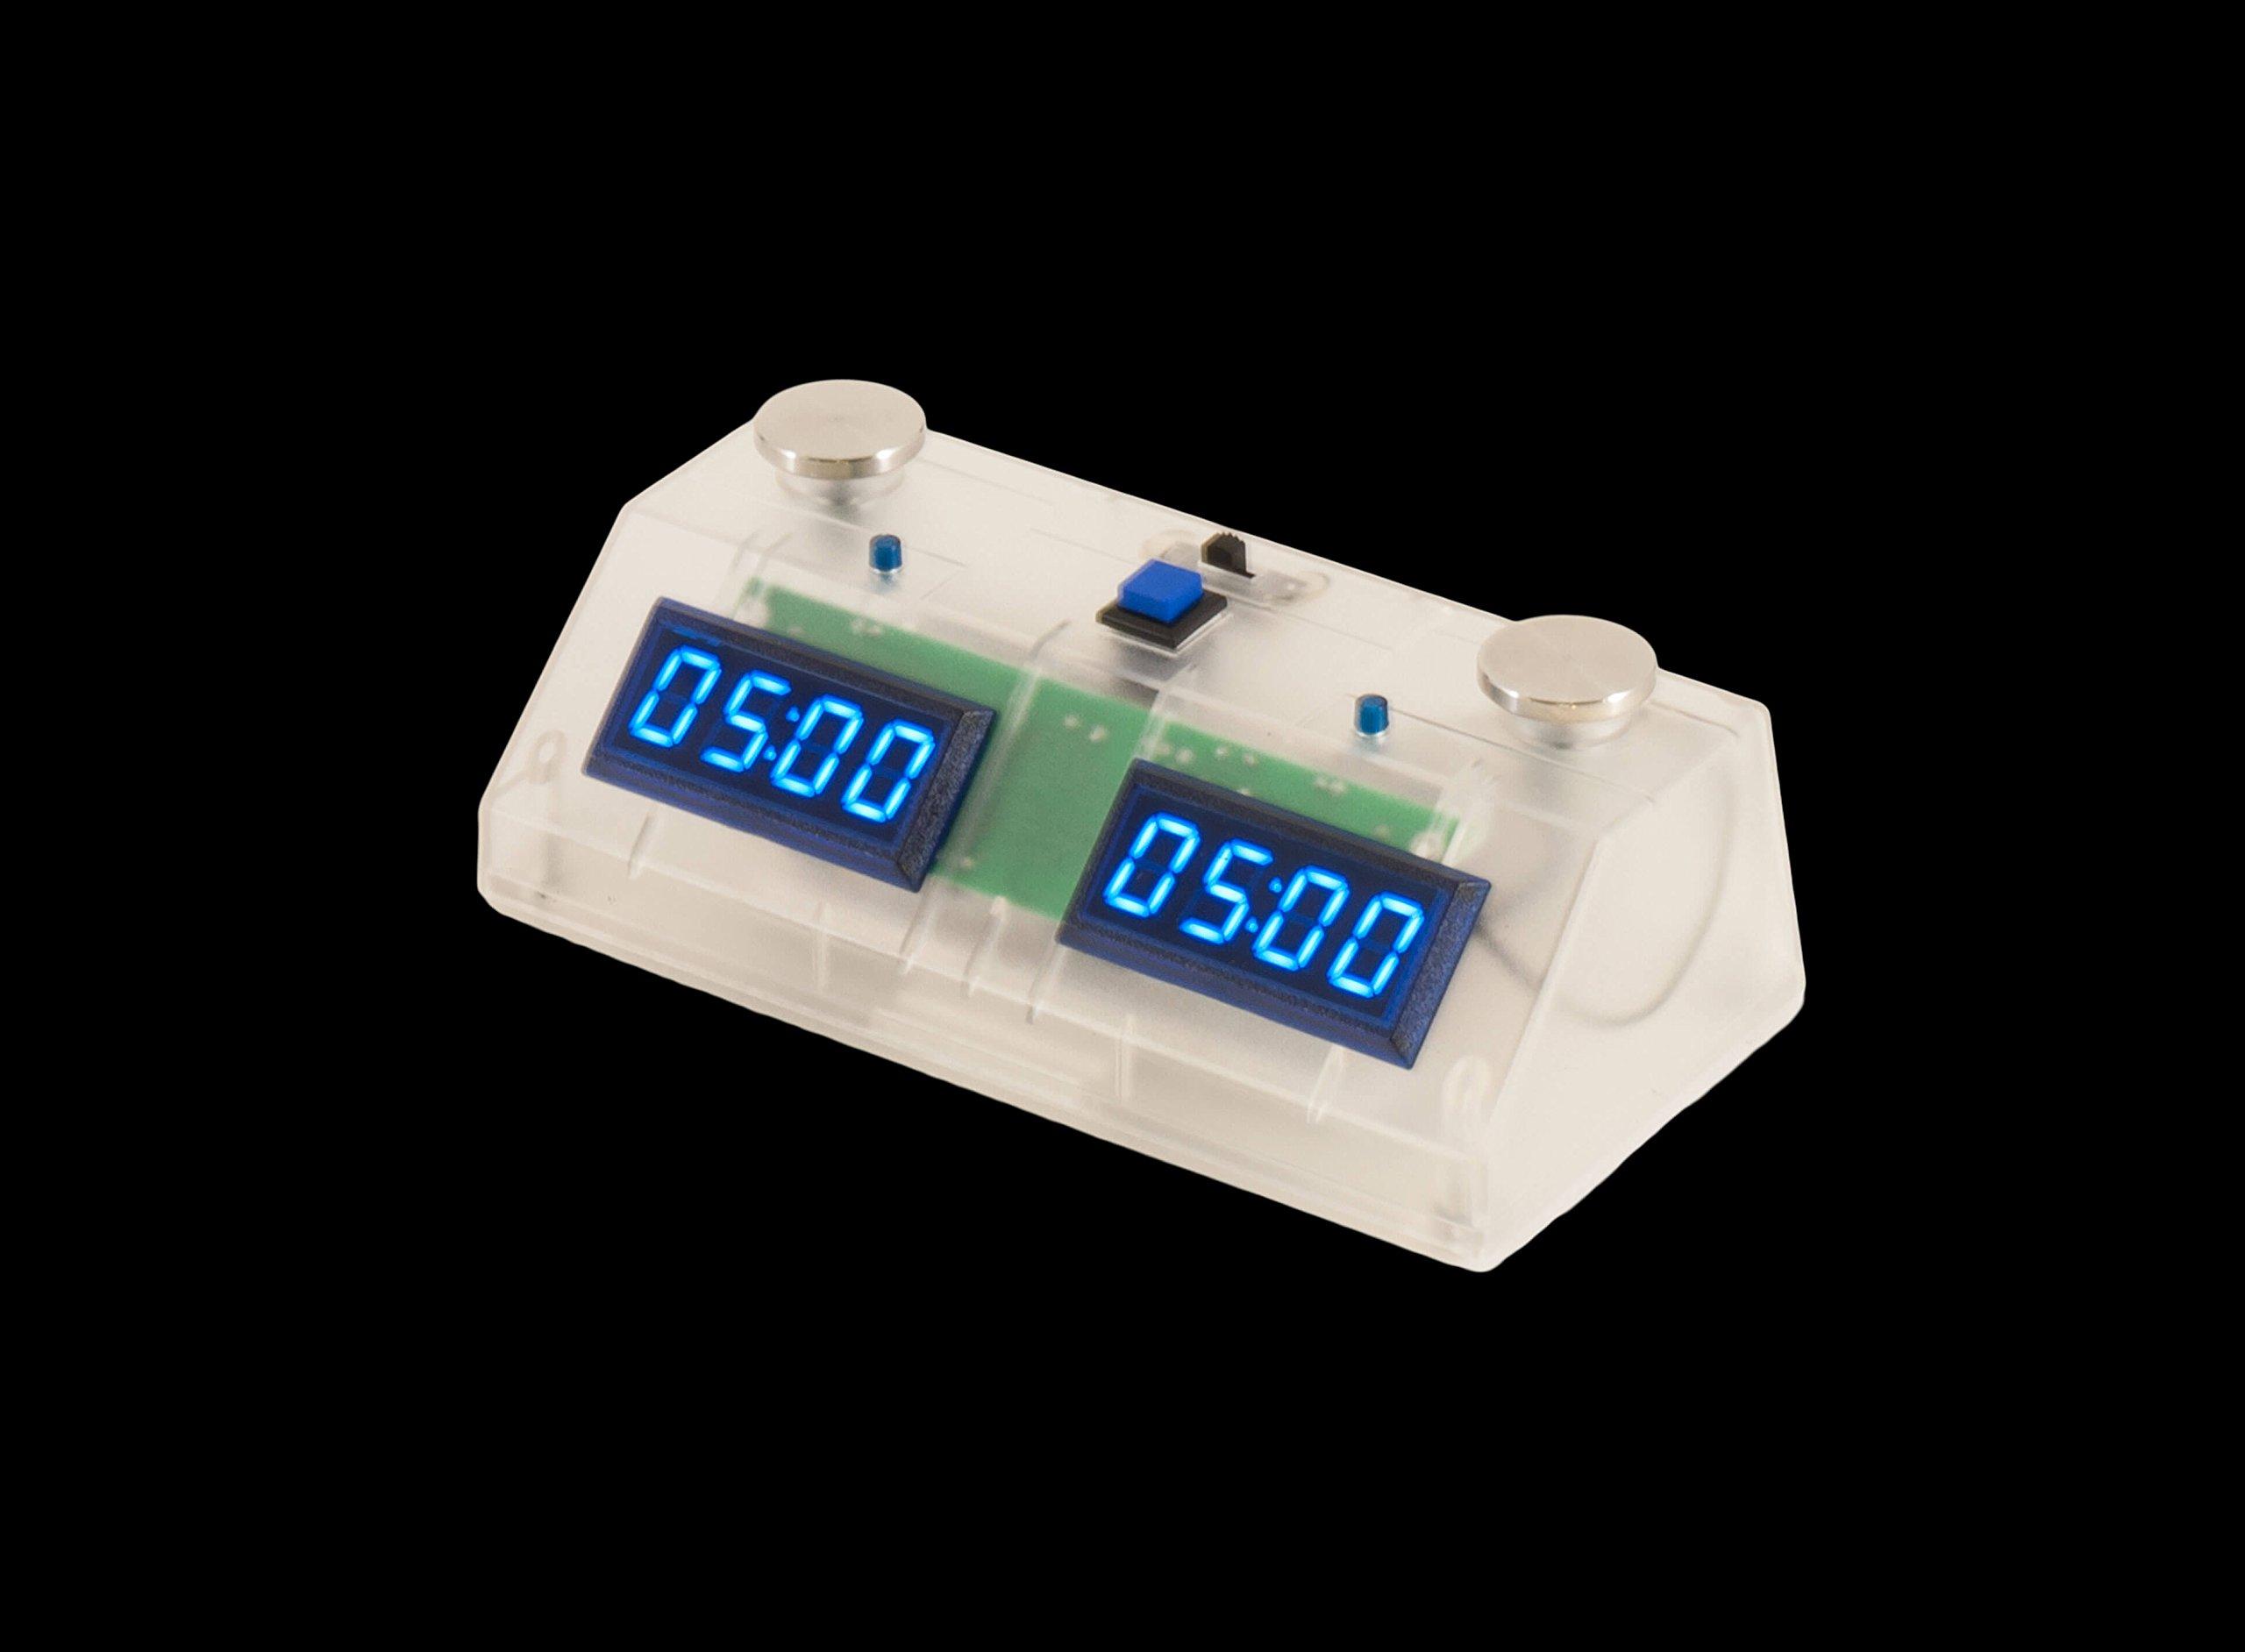 ZMart Fun II Digital Chess Clock with clear Exterior - Blue